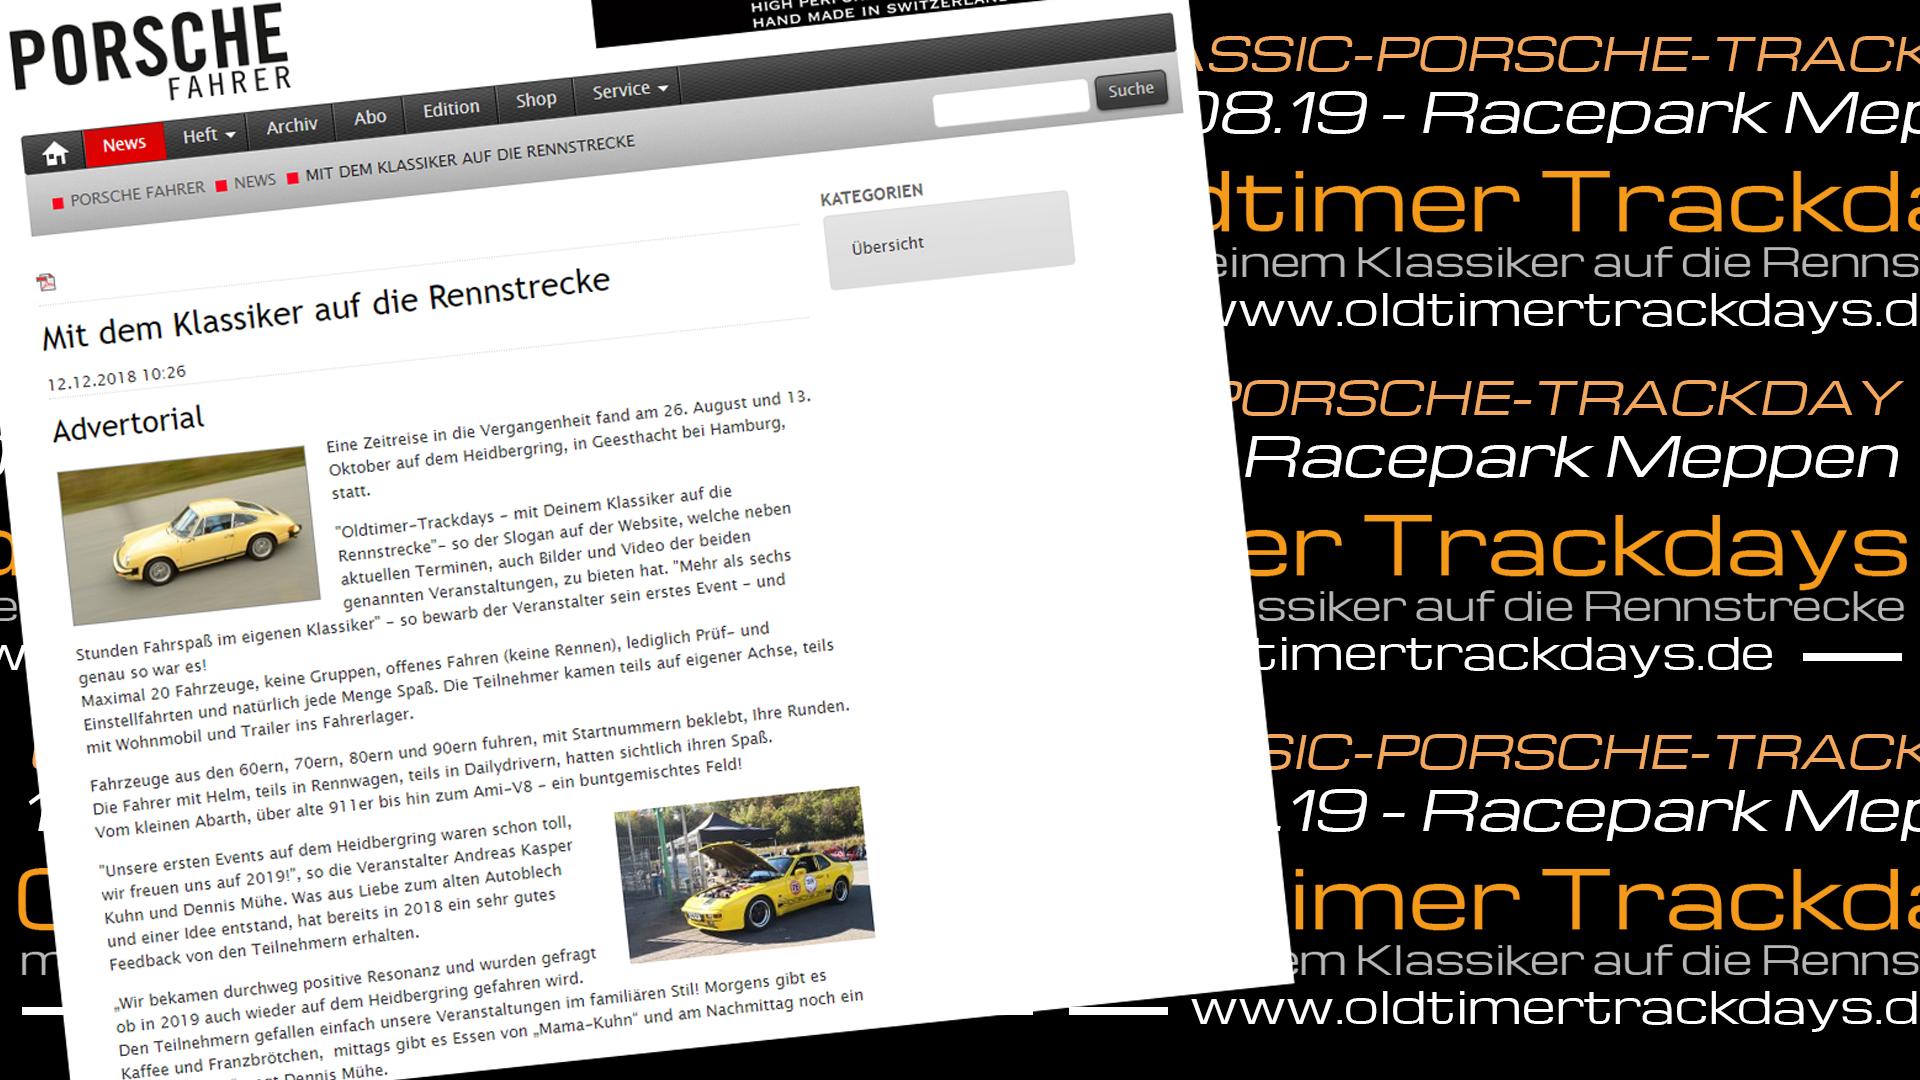 Porsche Trackday Oldtimer